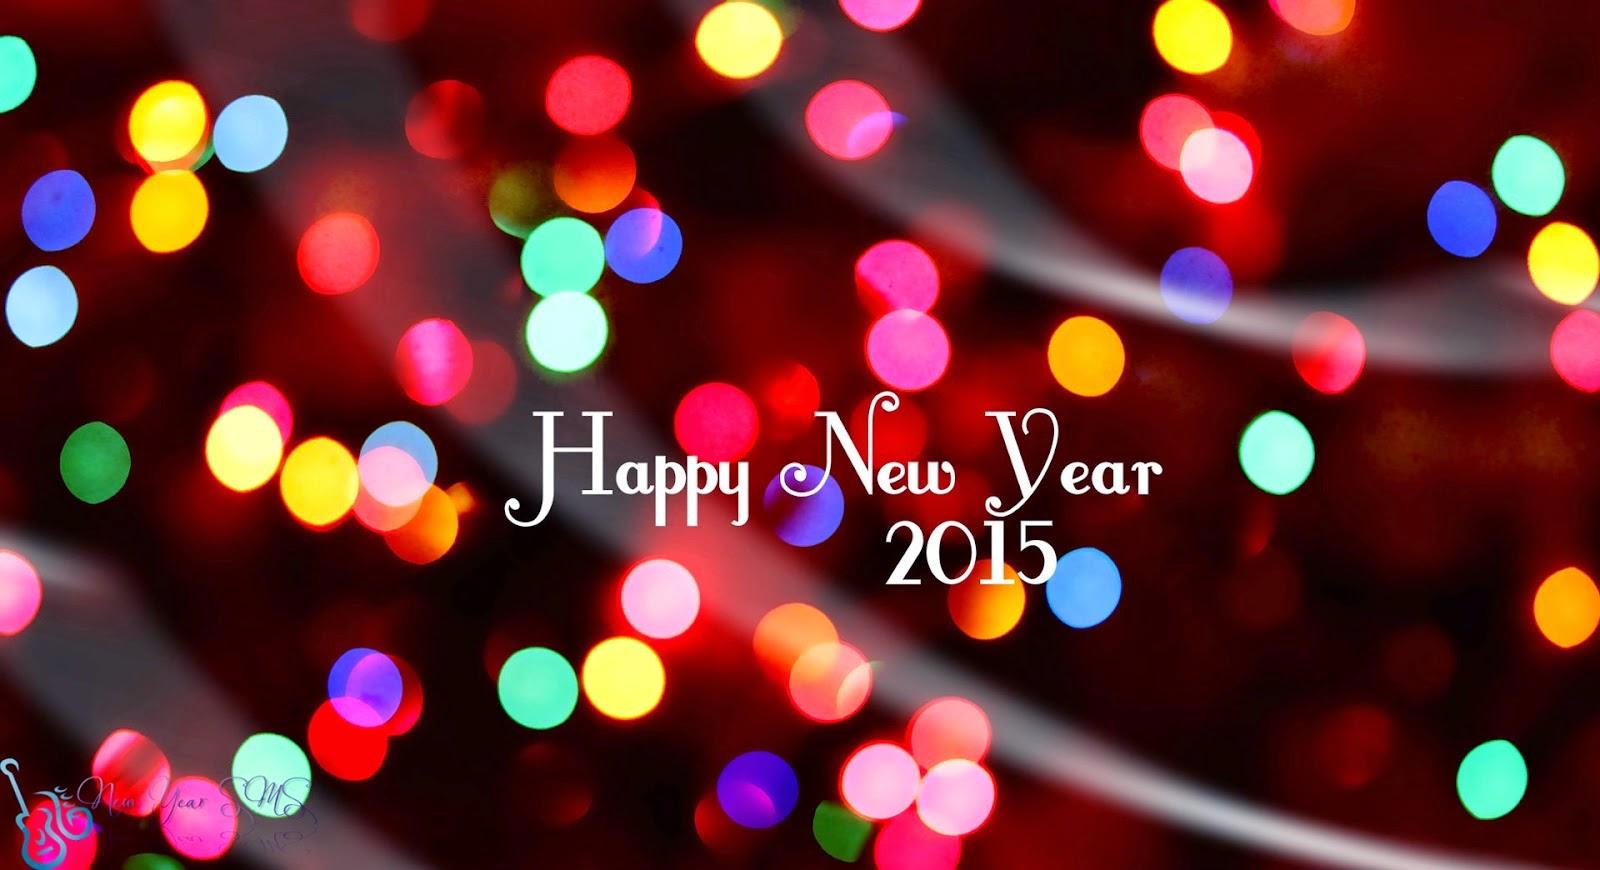 happy new year 2015 wallpapers happy new year 2015 wallpapers 1600x870